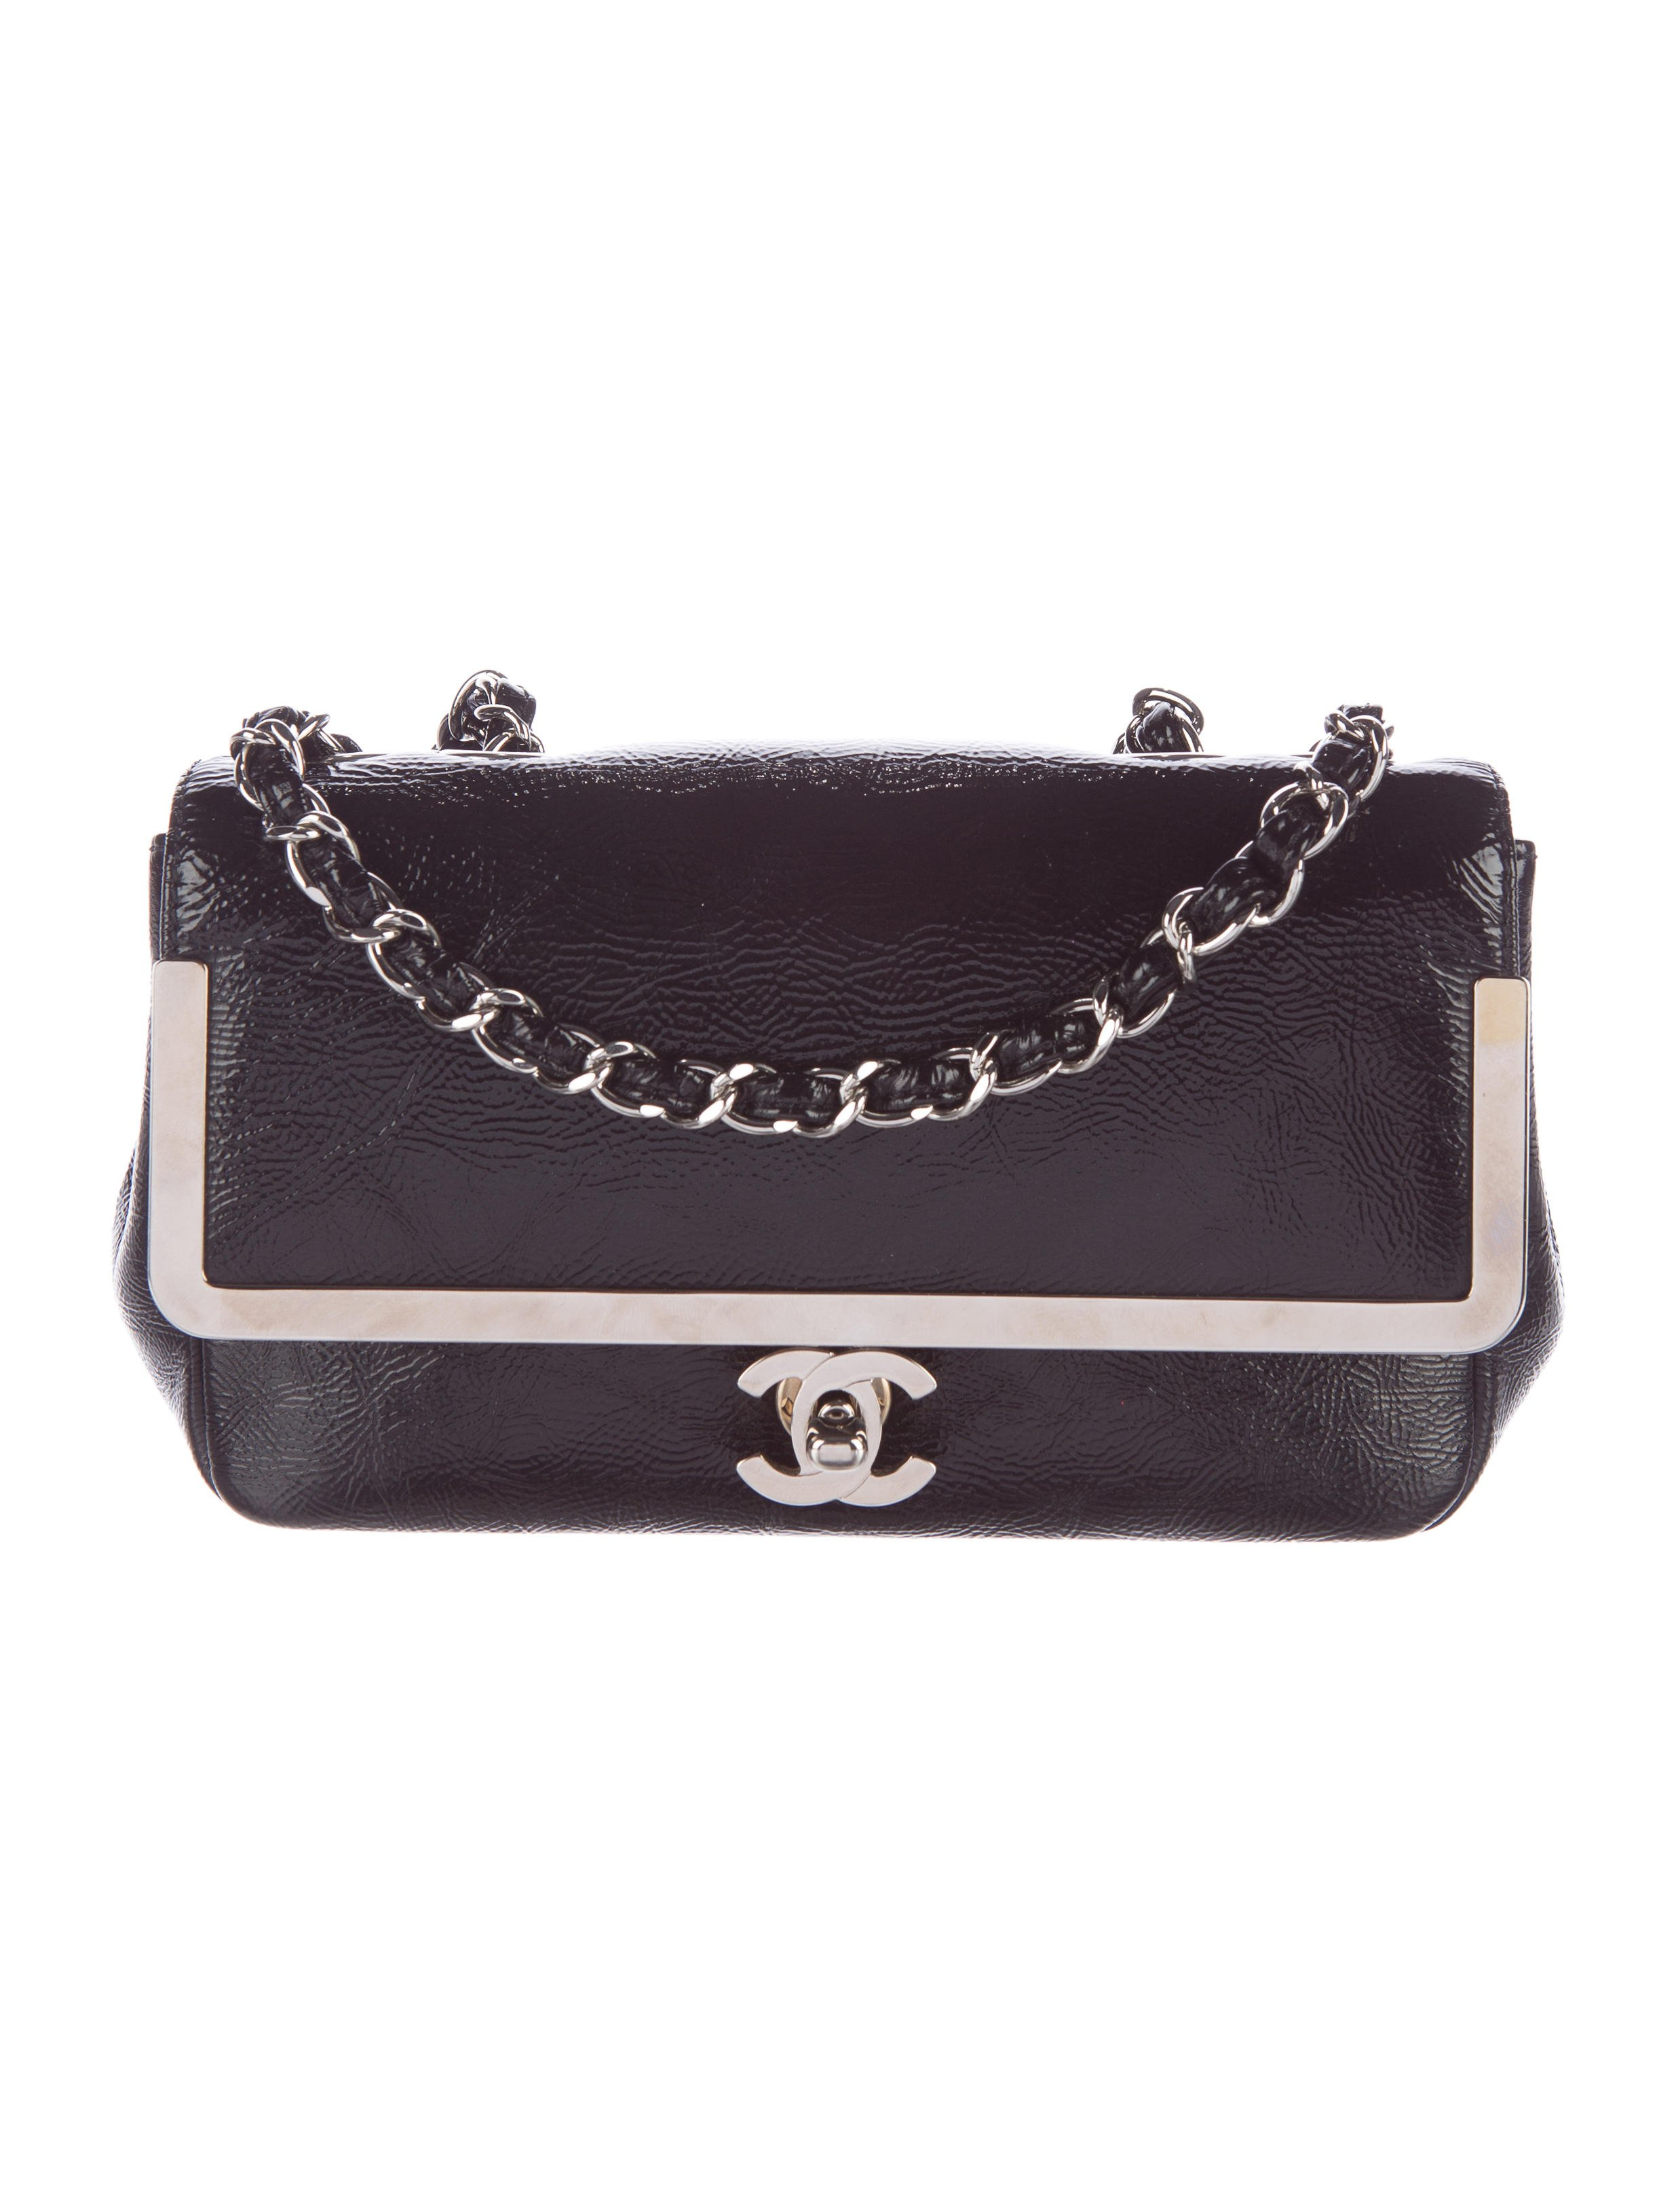 d0950ce39597 Chanel Glazed Calfskin Small Flap Bag - Consignment Item · Melegance ...